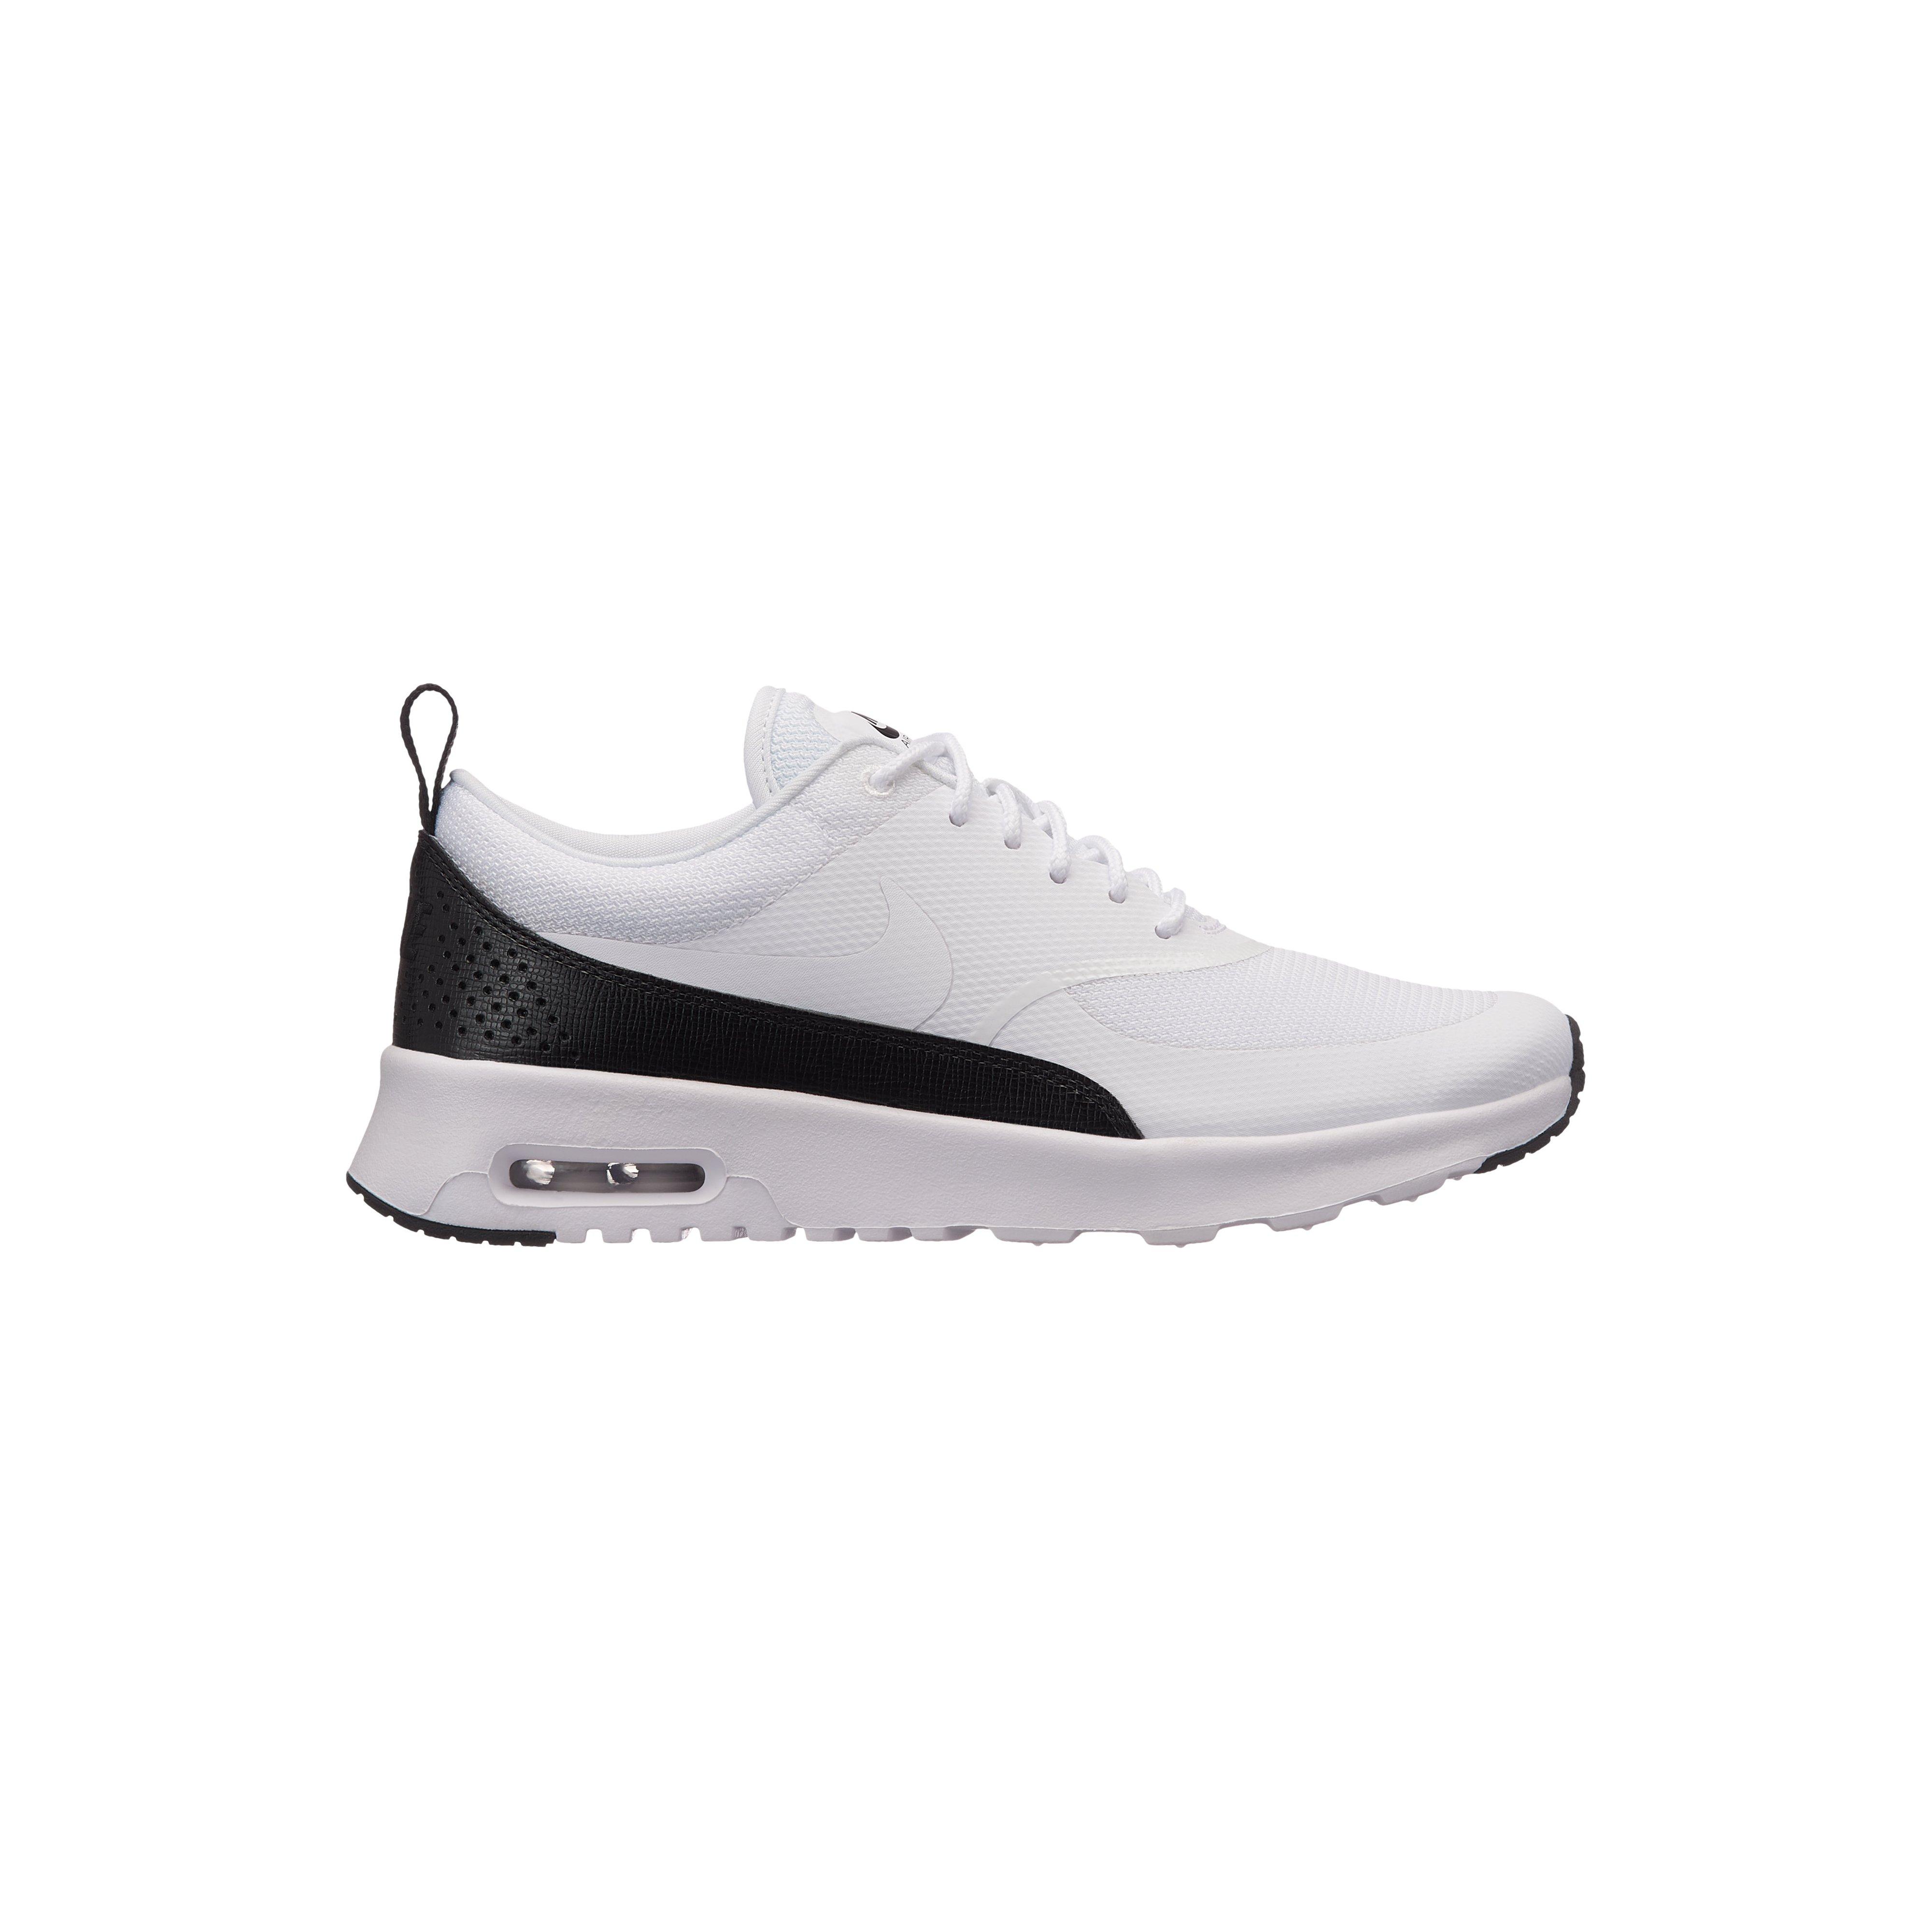 Nike Air Max Thea, whitewhite, dame